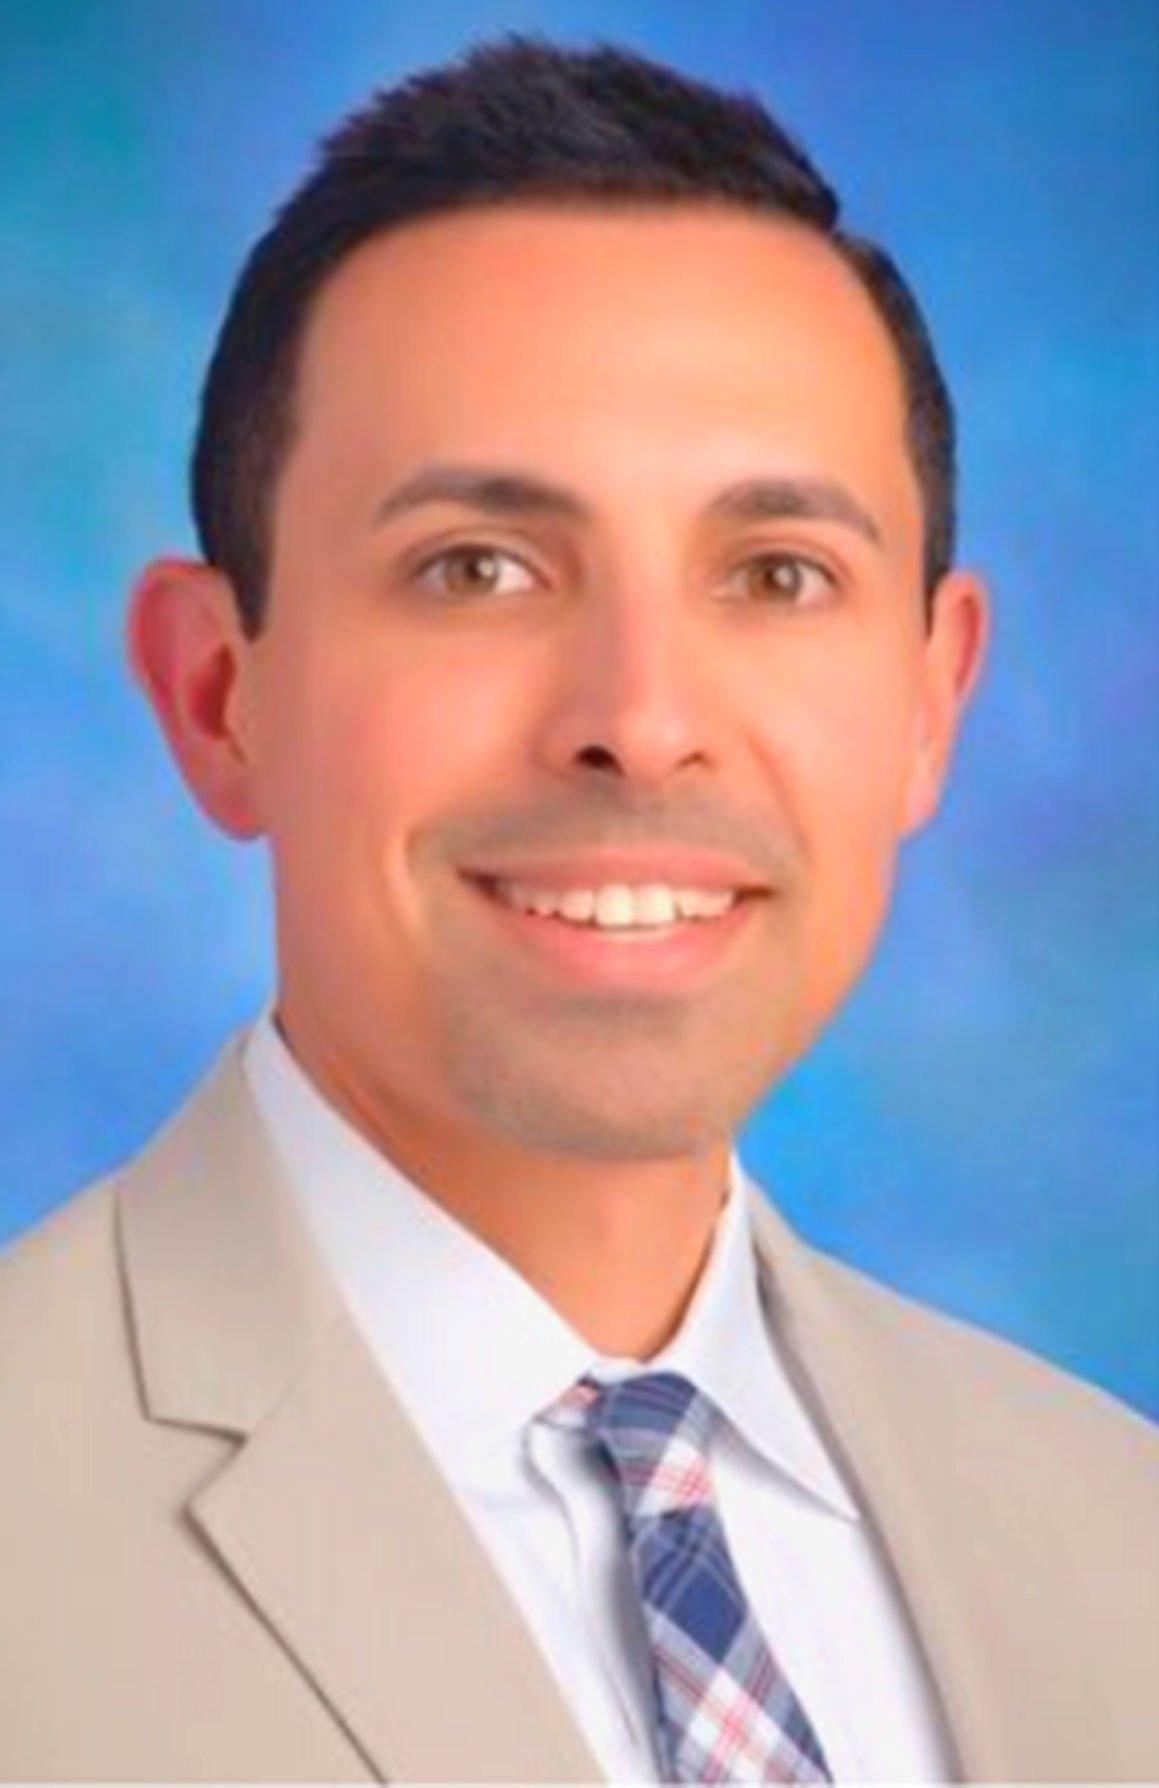 Matthew Gutierrez